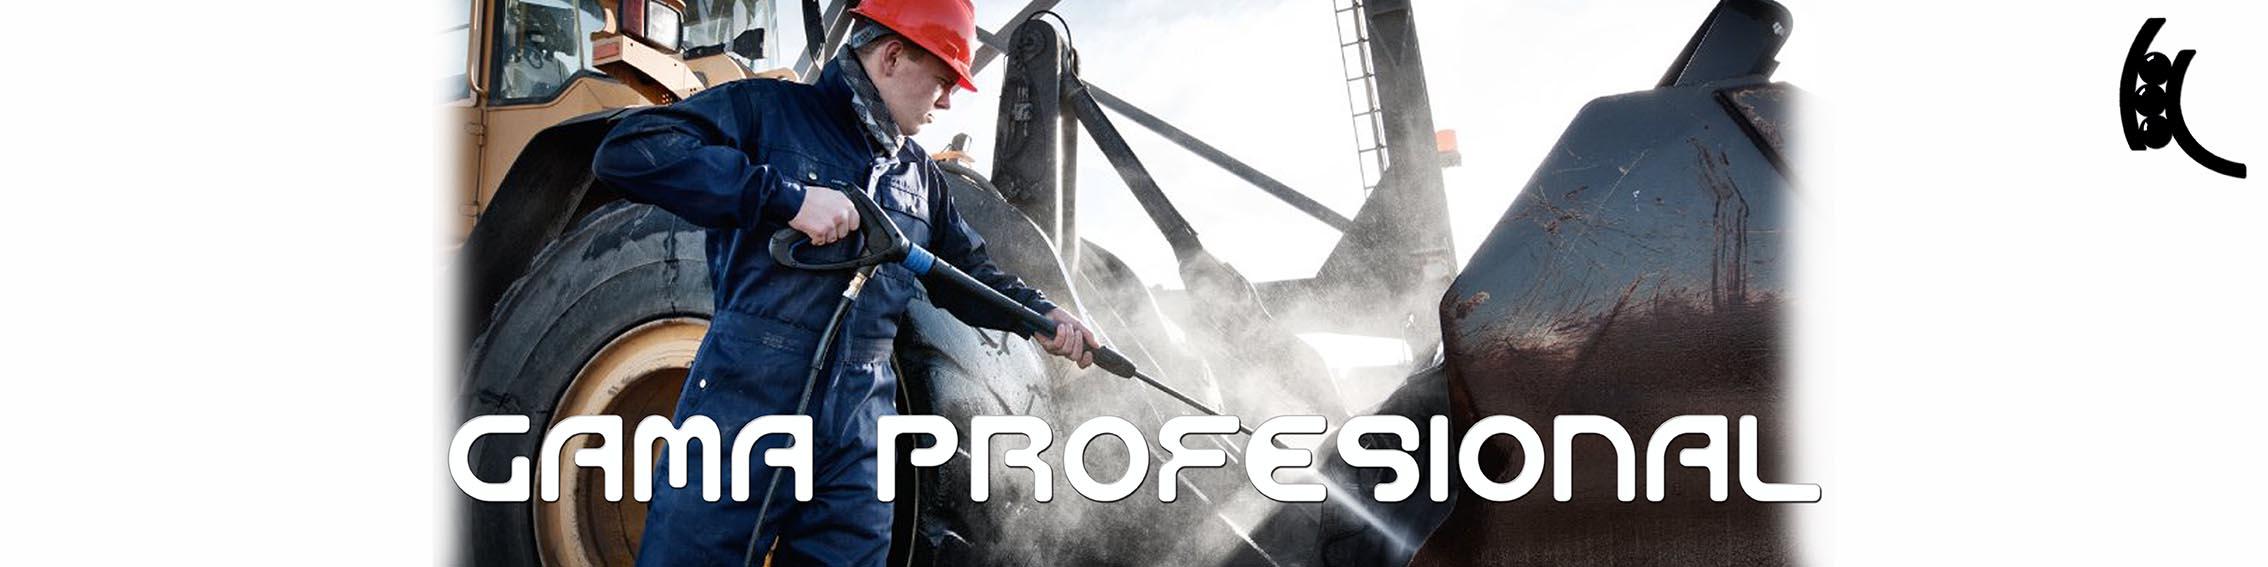 gama profesional 2.jpg